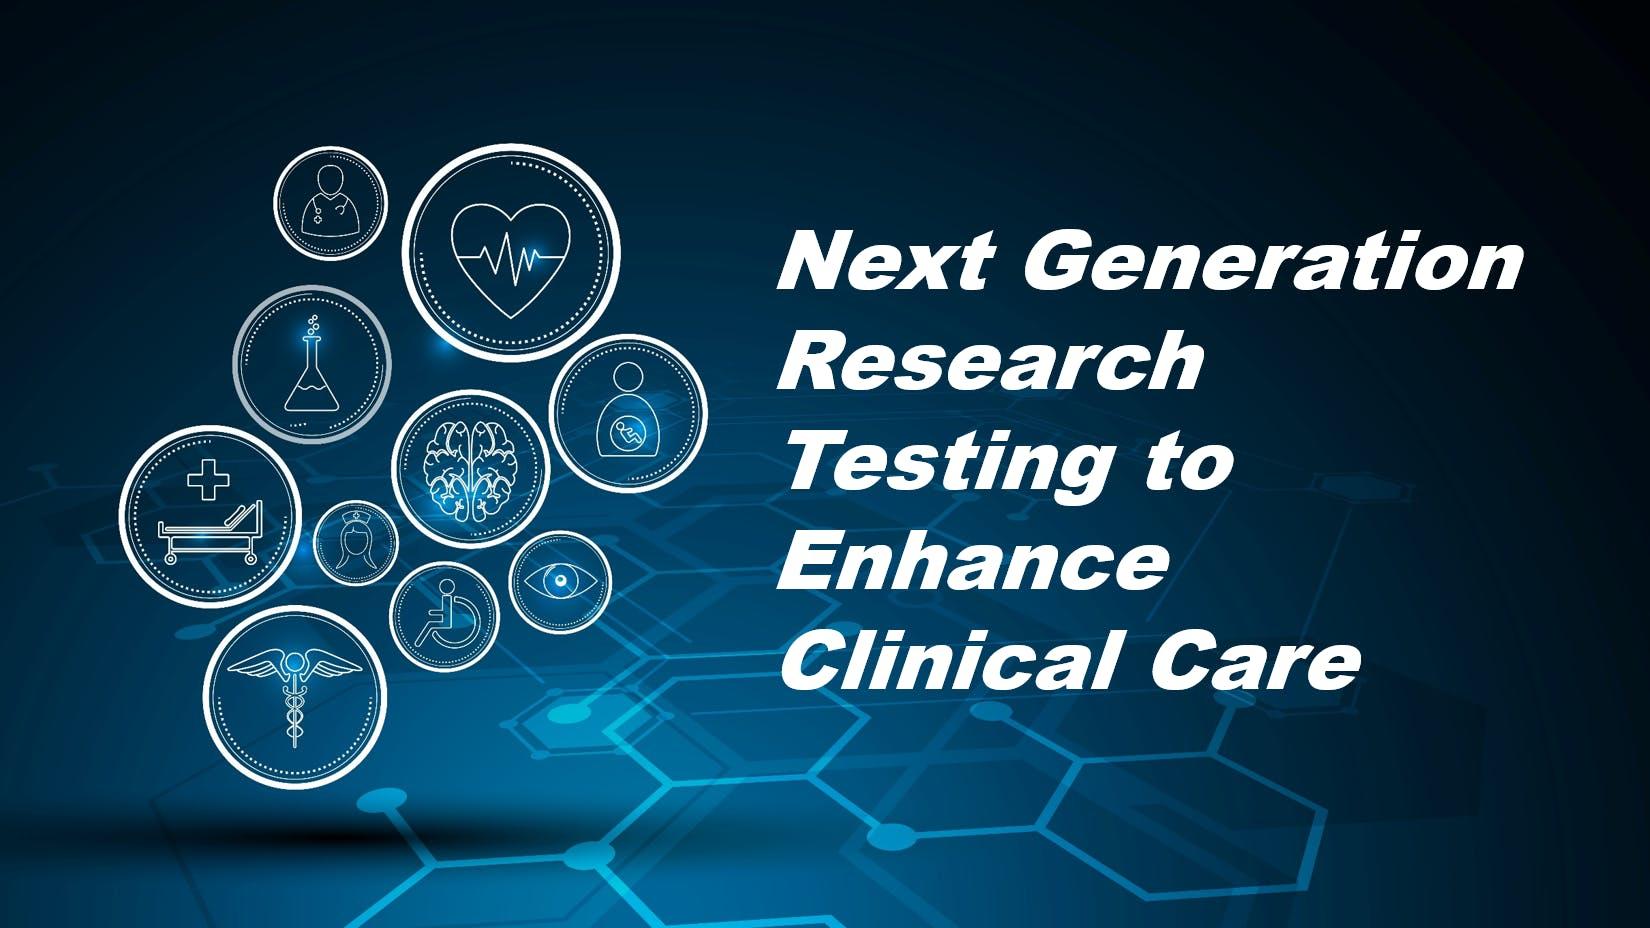 Symposium: Next Generation Research Testing